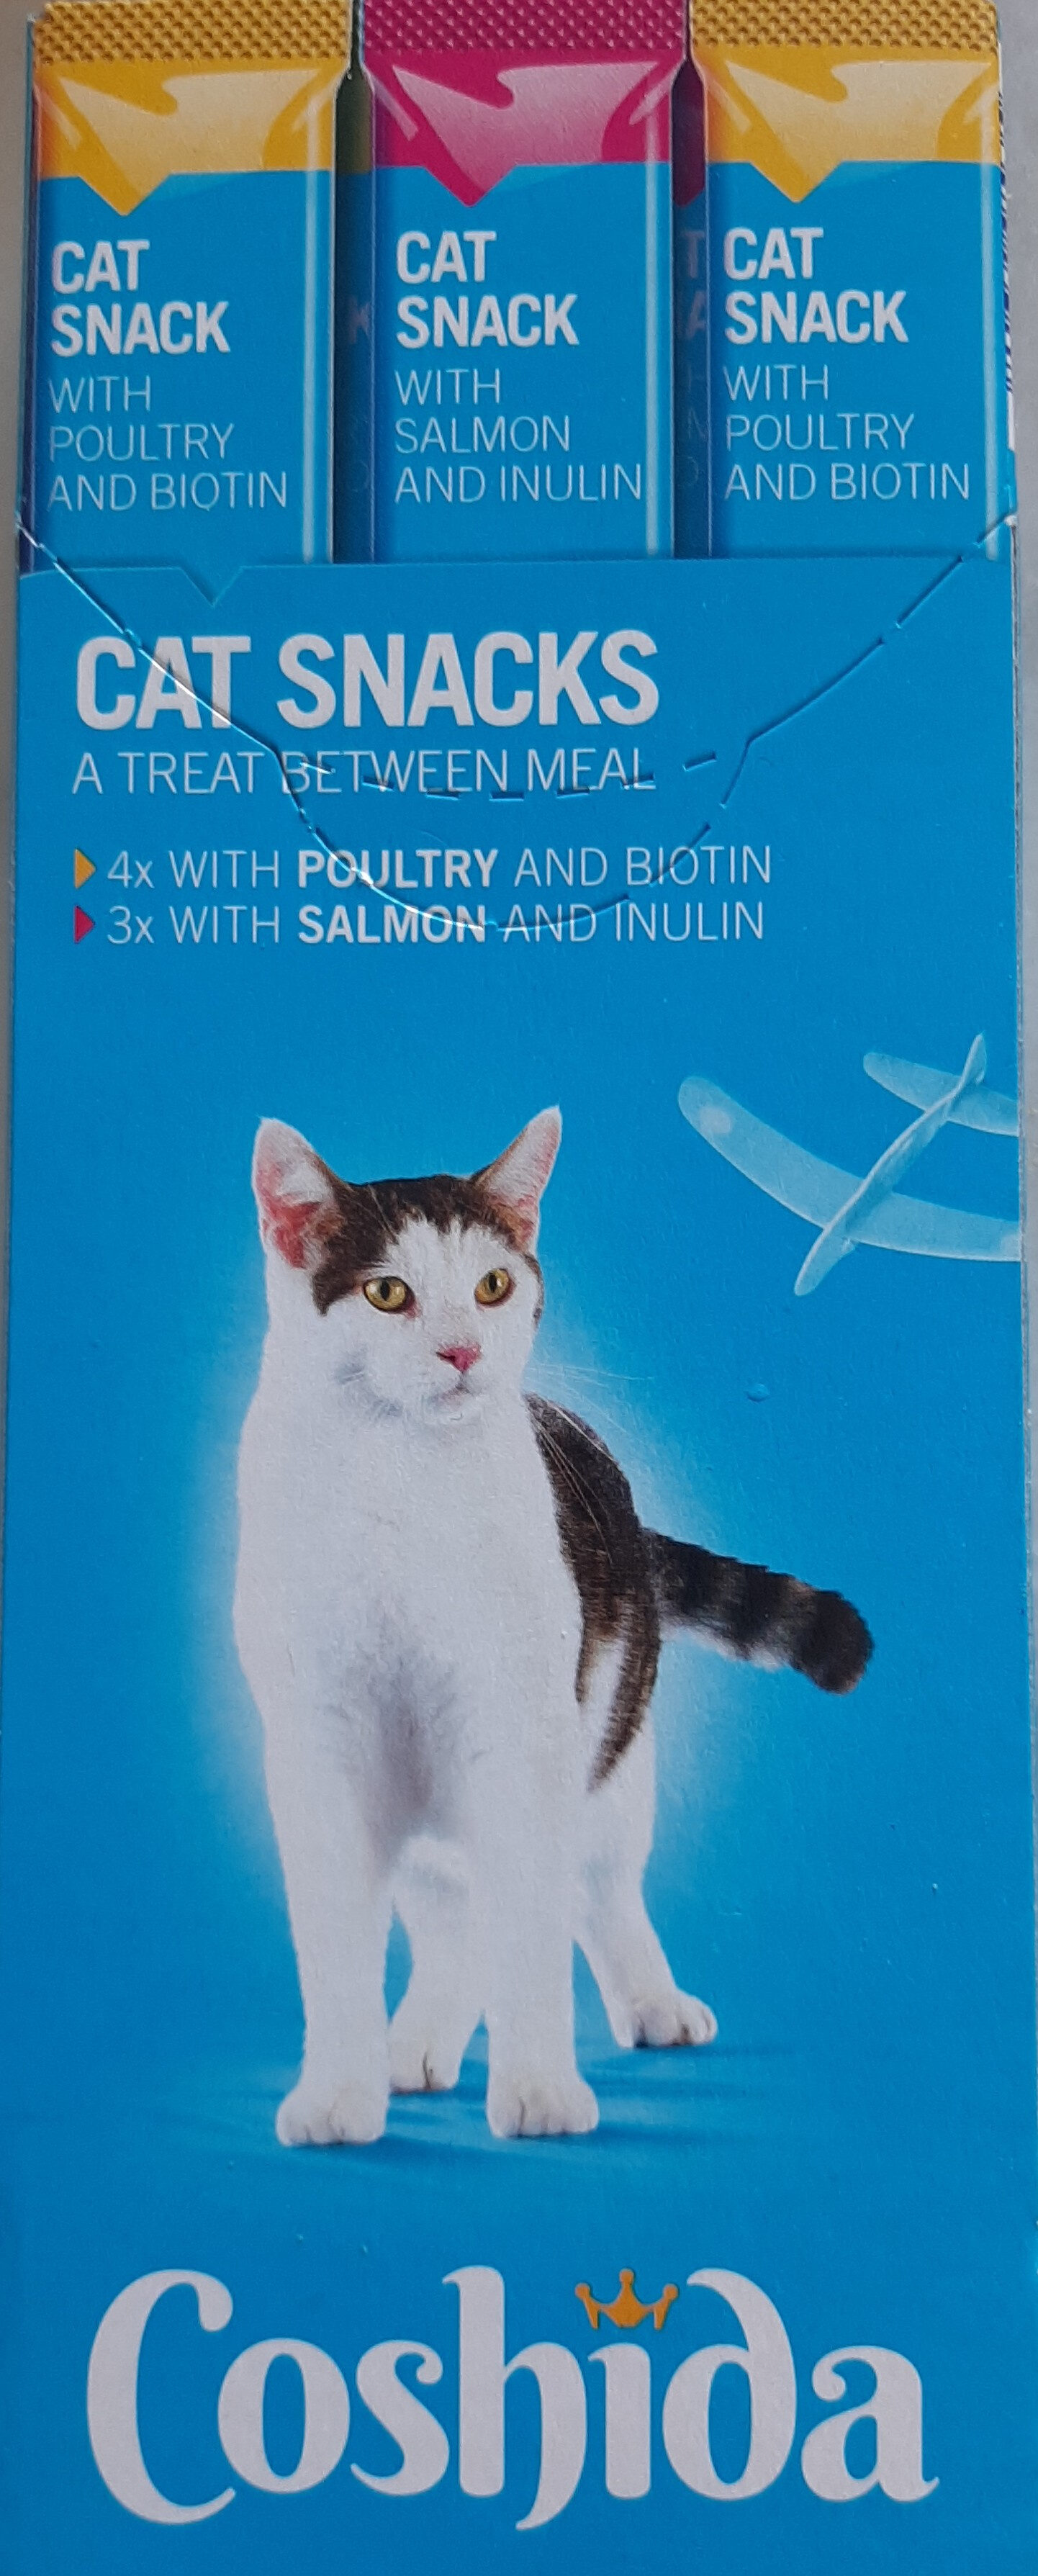 Cat snacks - Product